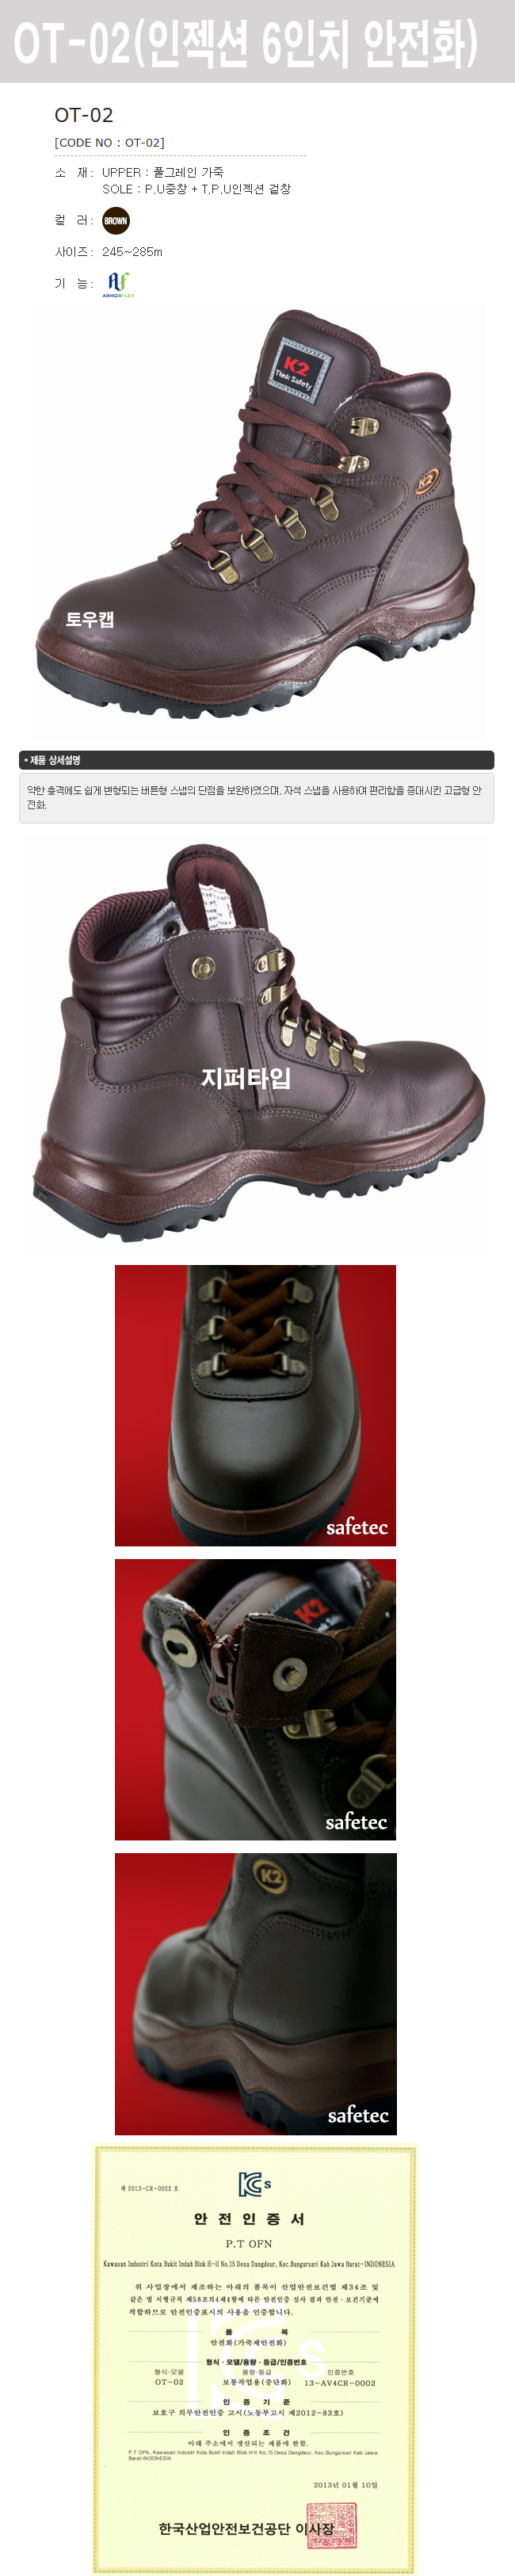 new style 337e8 b823e 상품상세 결제 배송 교환및반품 서비스문의 상품Q A 관련상품